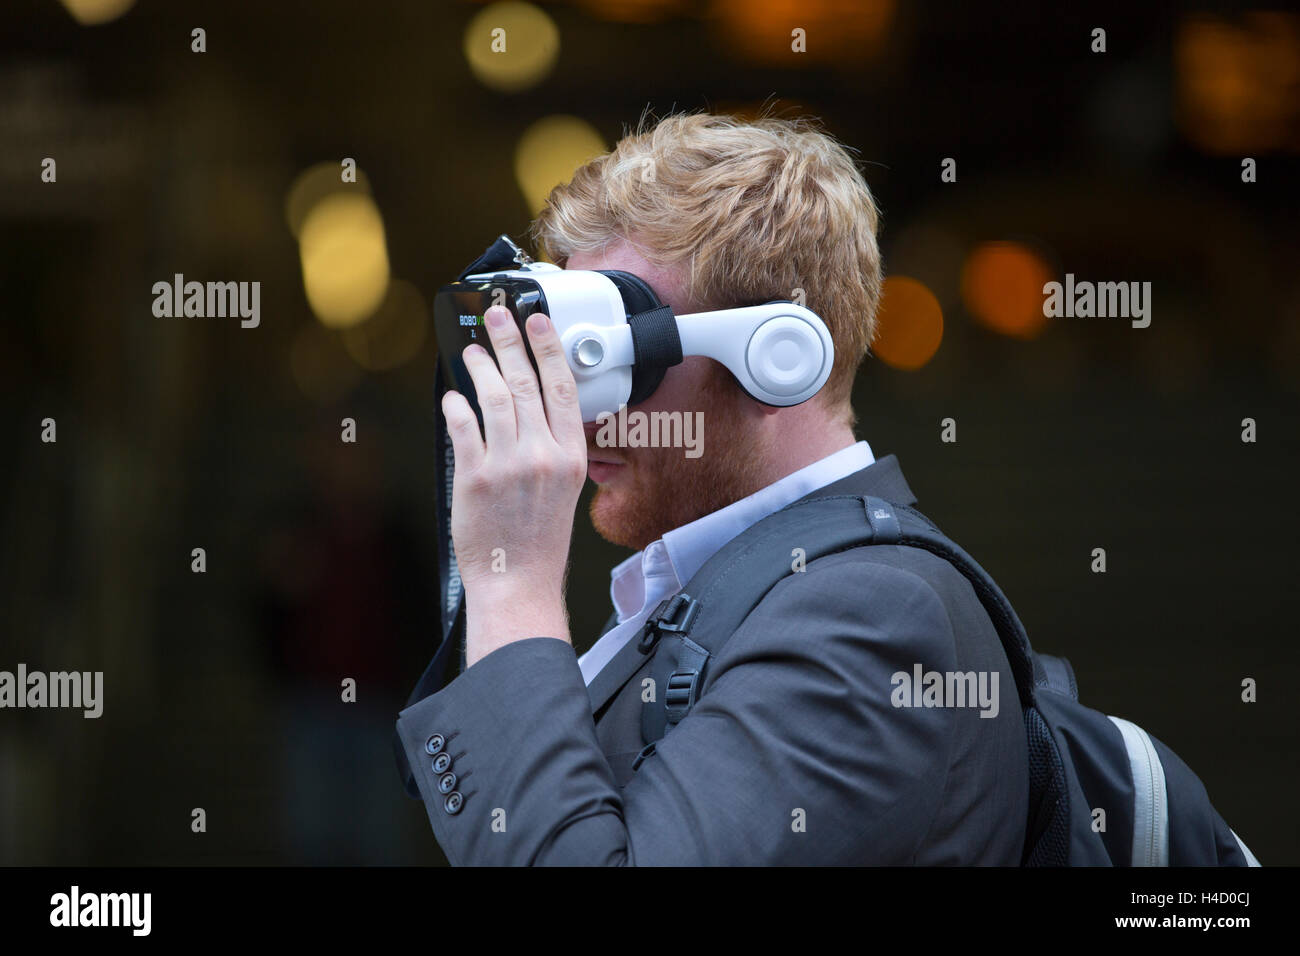 Man wearing Virtual Reality Headset BOBOVR Z4 on the streets of London, UK - Stock Image